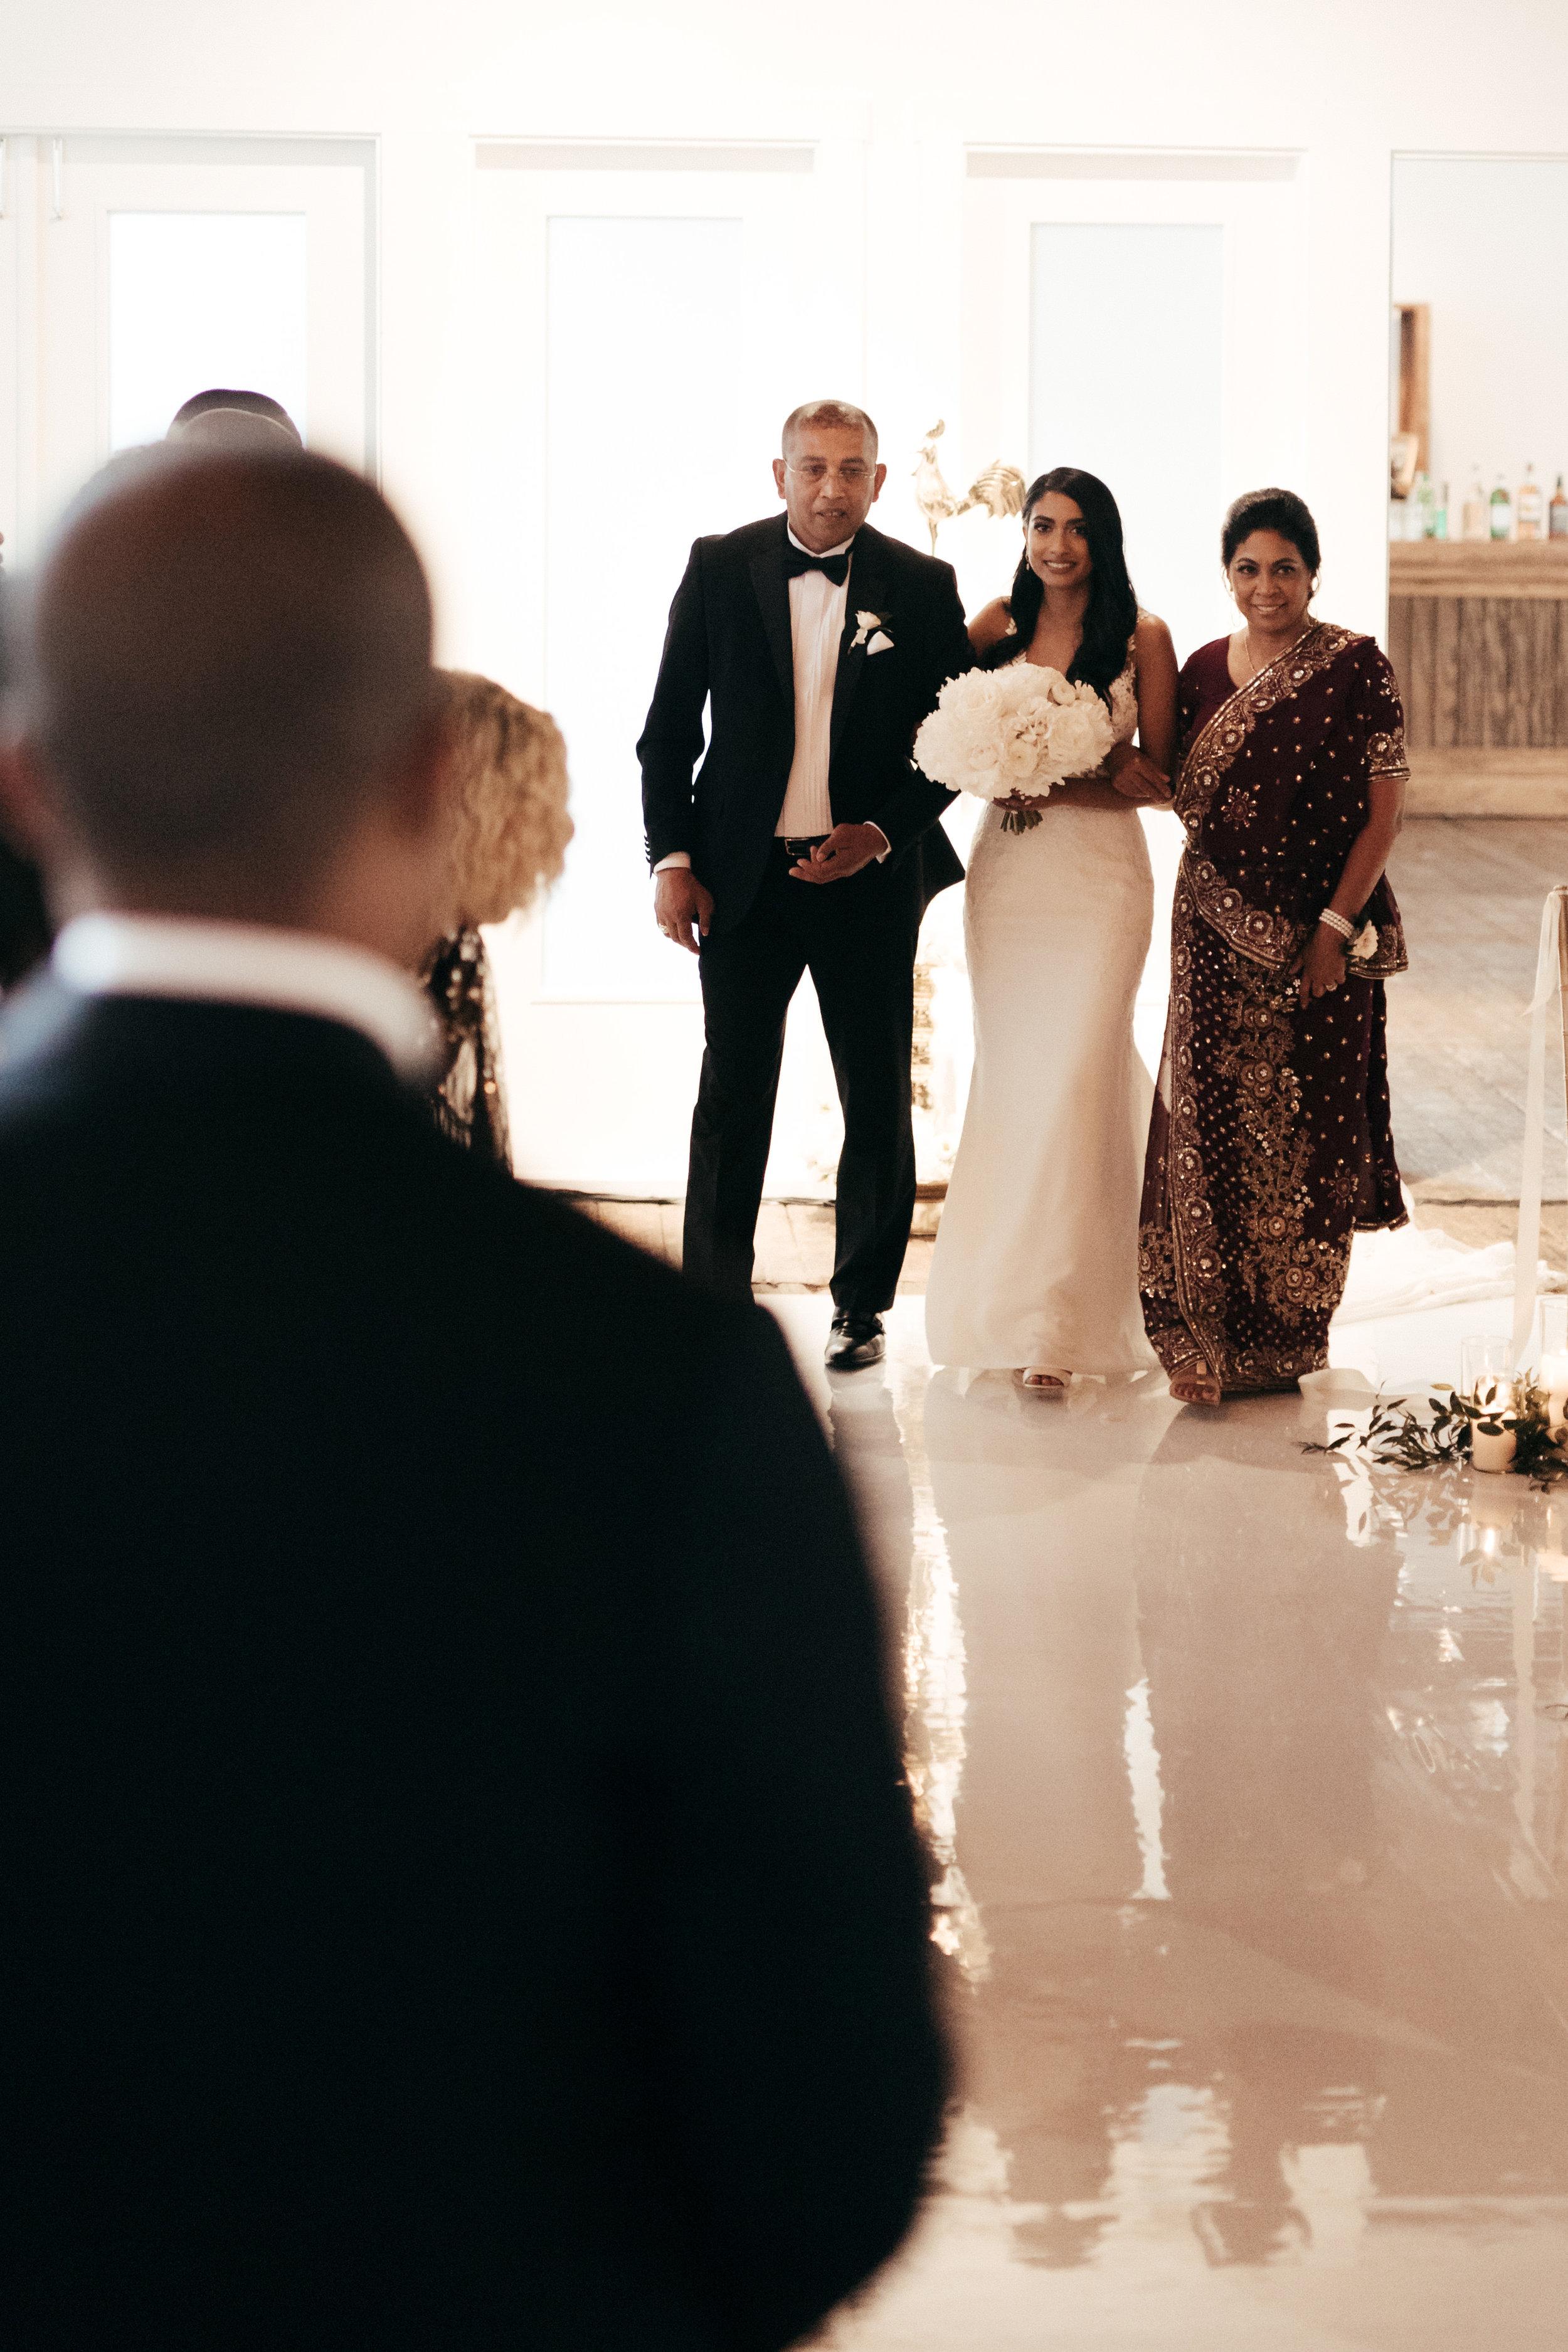 Mindy&Jared-wedding-by-LadiesAndGentlemen-by-Matija-Vuri-3349.jpg